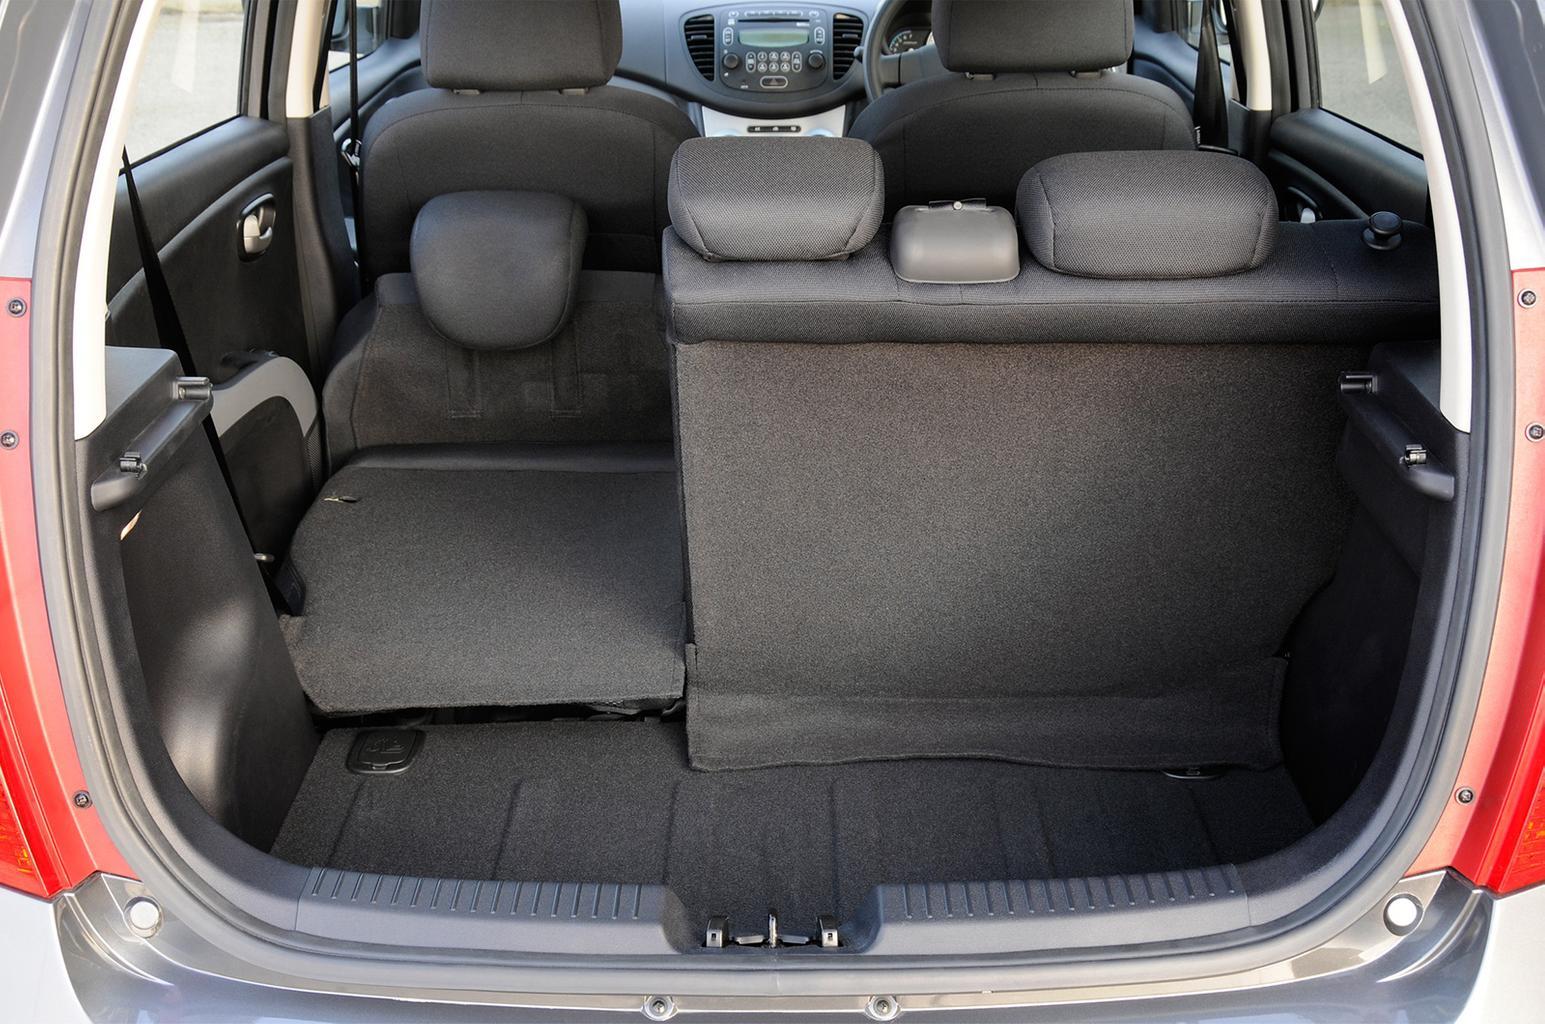 Used car of the week: Hyundai i10